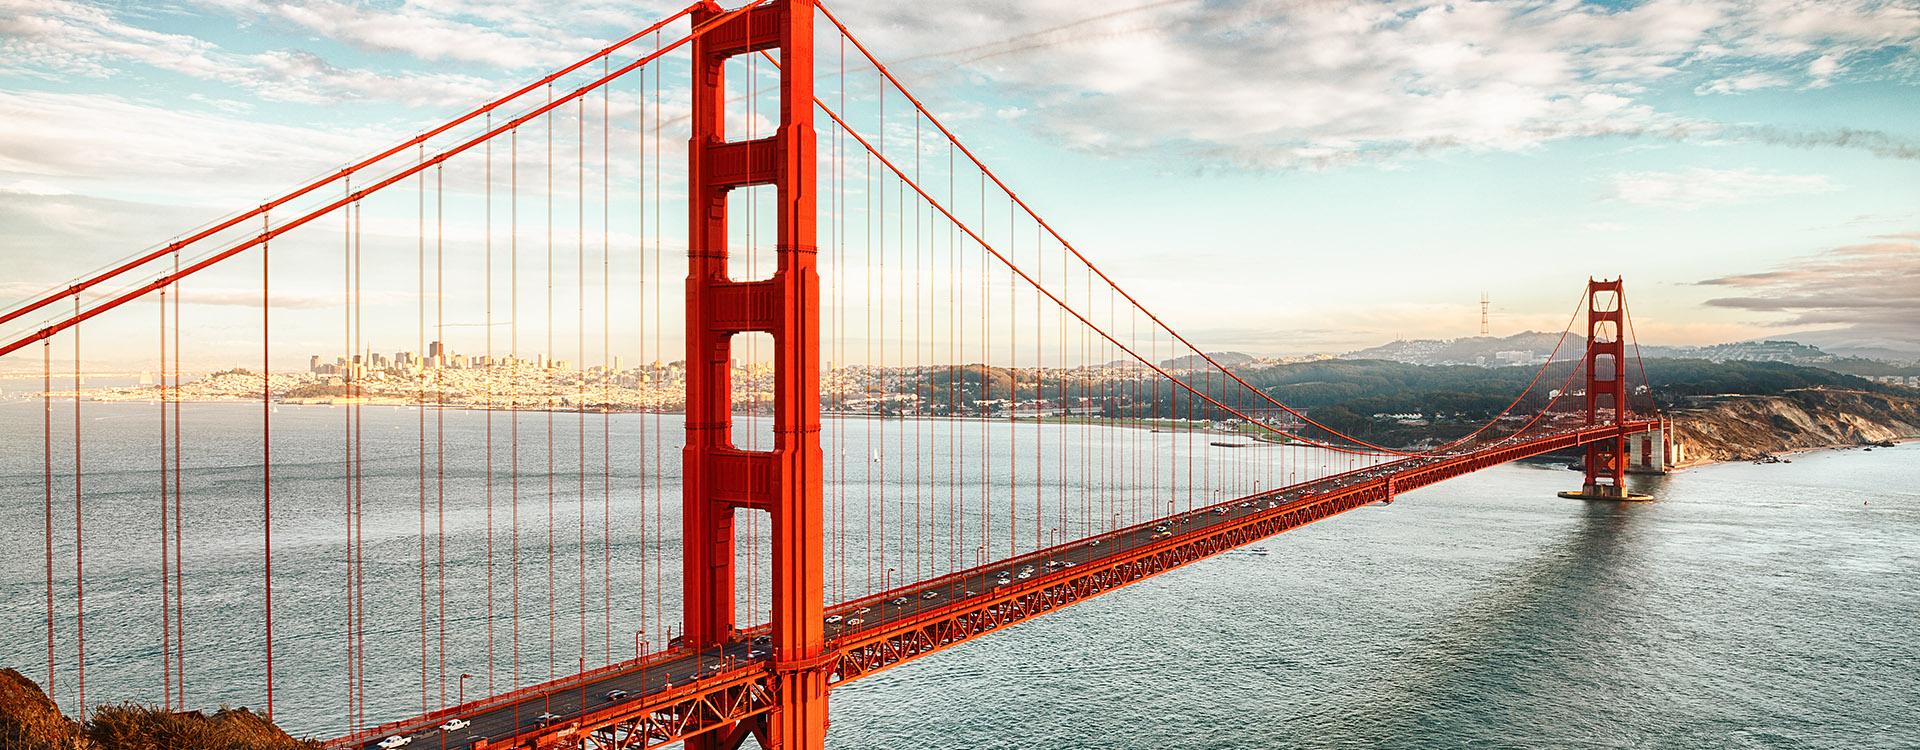 famous Golden Gate Bridge, San Francisco at night, USA